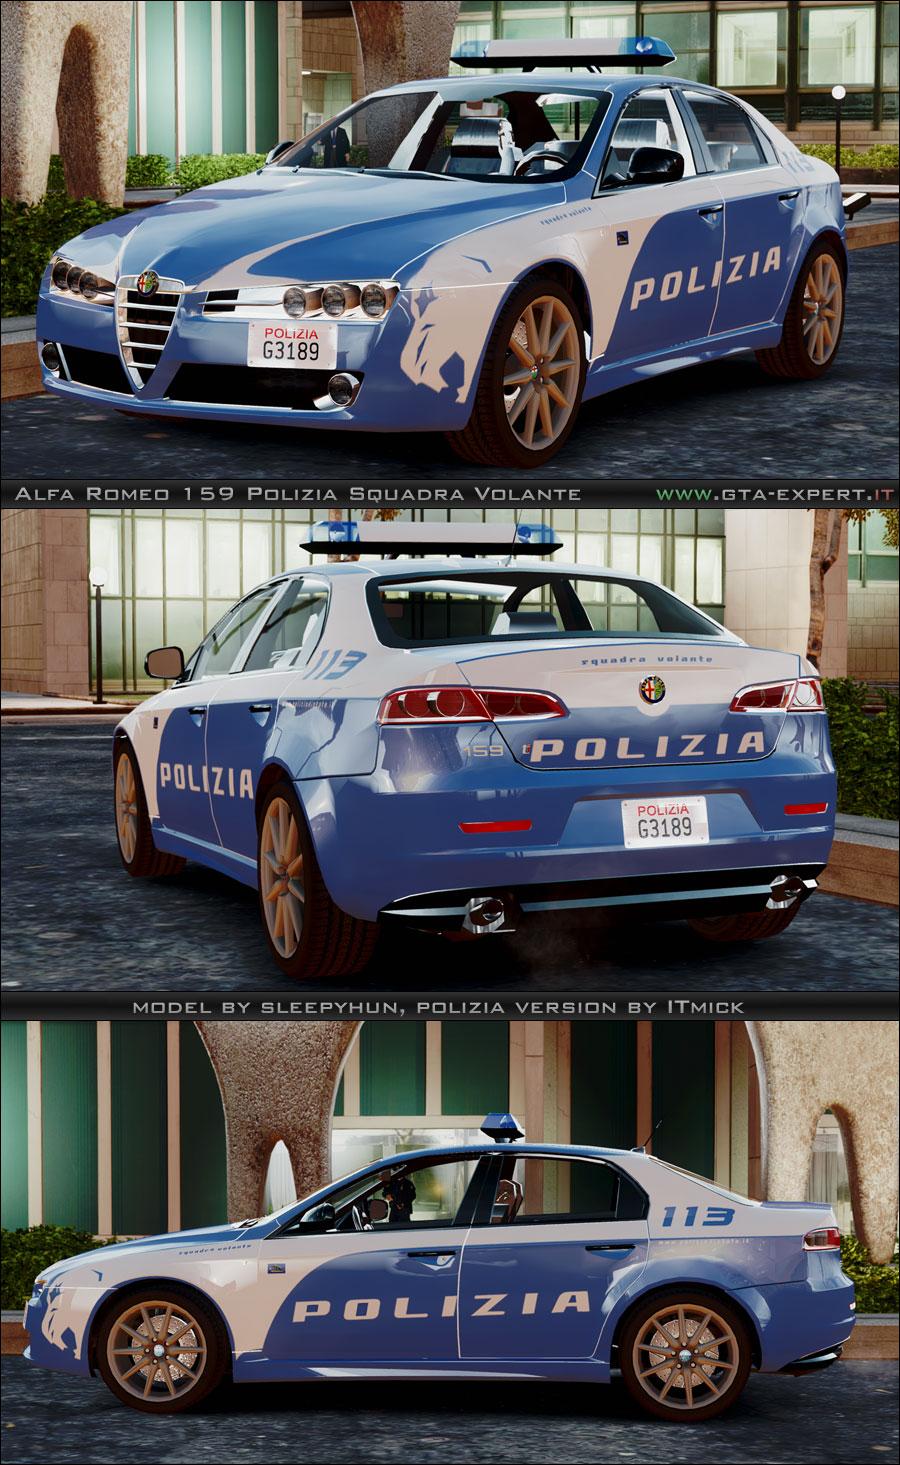 Alfa Romeo Policja Gta Sa Chomikuj: